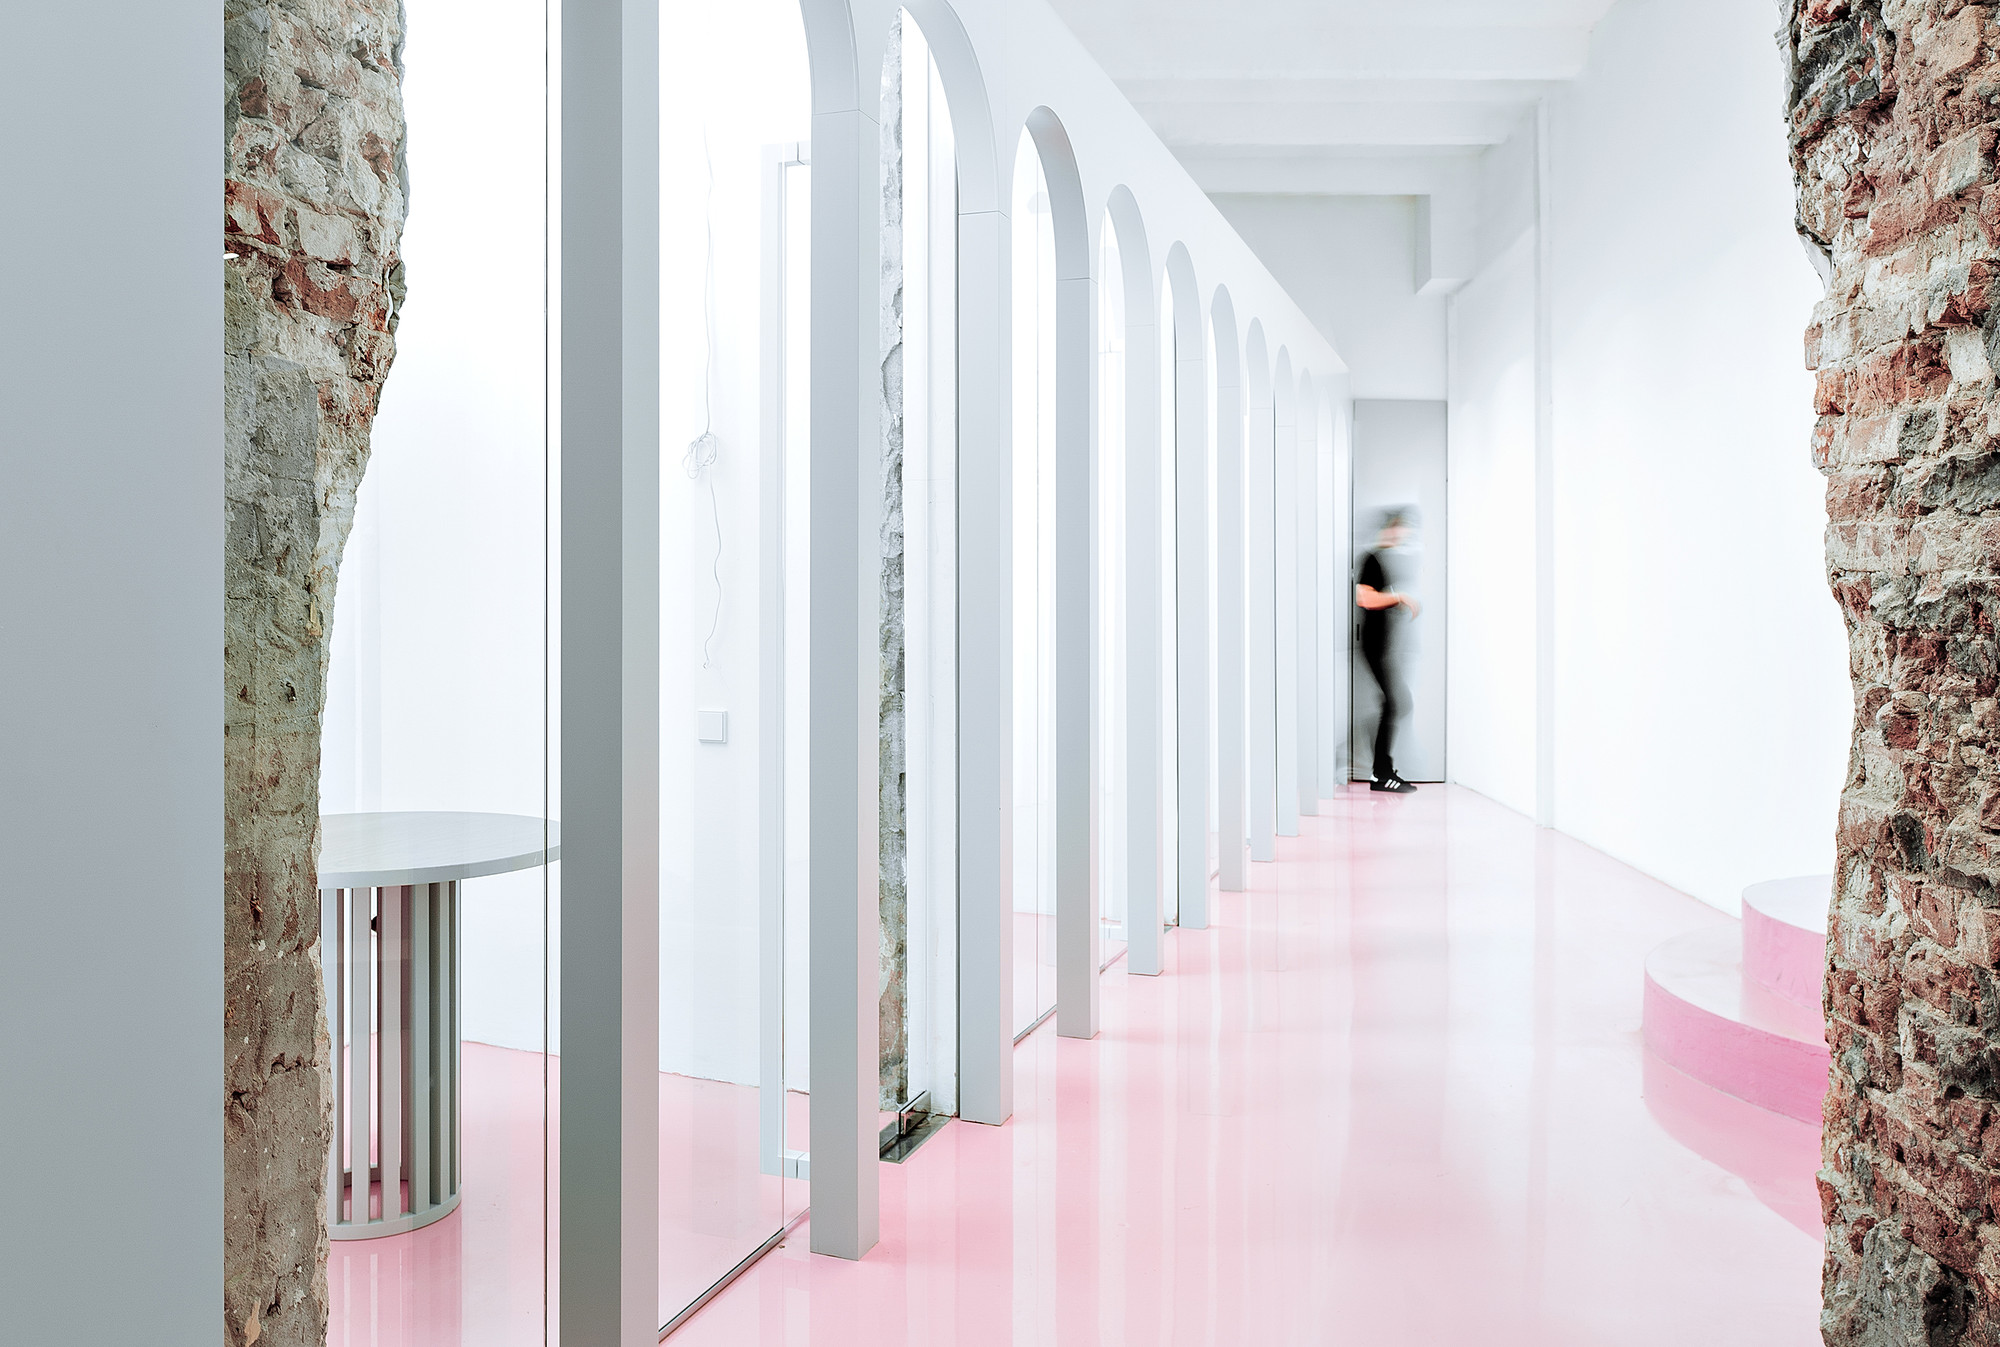 NGRS Recruiting Company  HQ  / Crosby Studios, © Evgeny Evgrafov